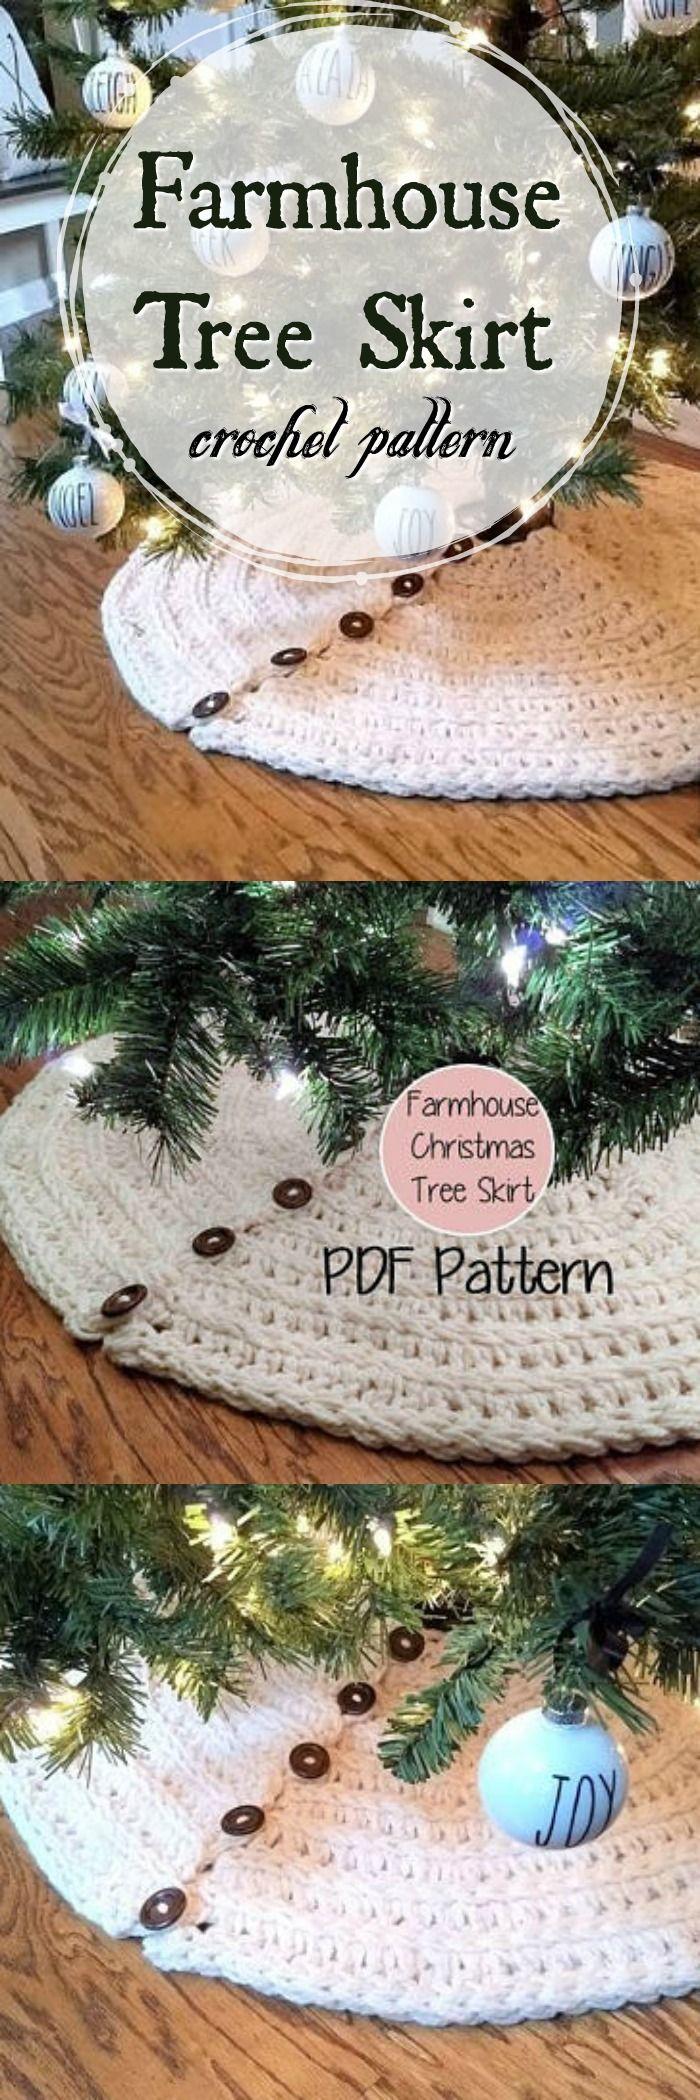 Farmhouse Christmas Tree Skirt Crochet Pattern I Love The Buttons This Rustic Tree Skir Crochet Christmas Trees Diy Christmas Tree Skirt Christmas Tree Skirt